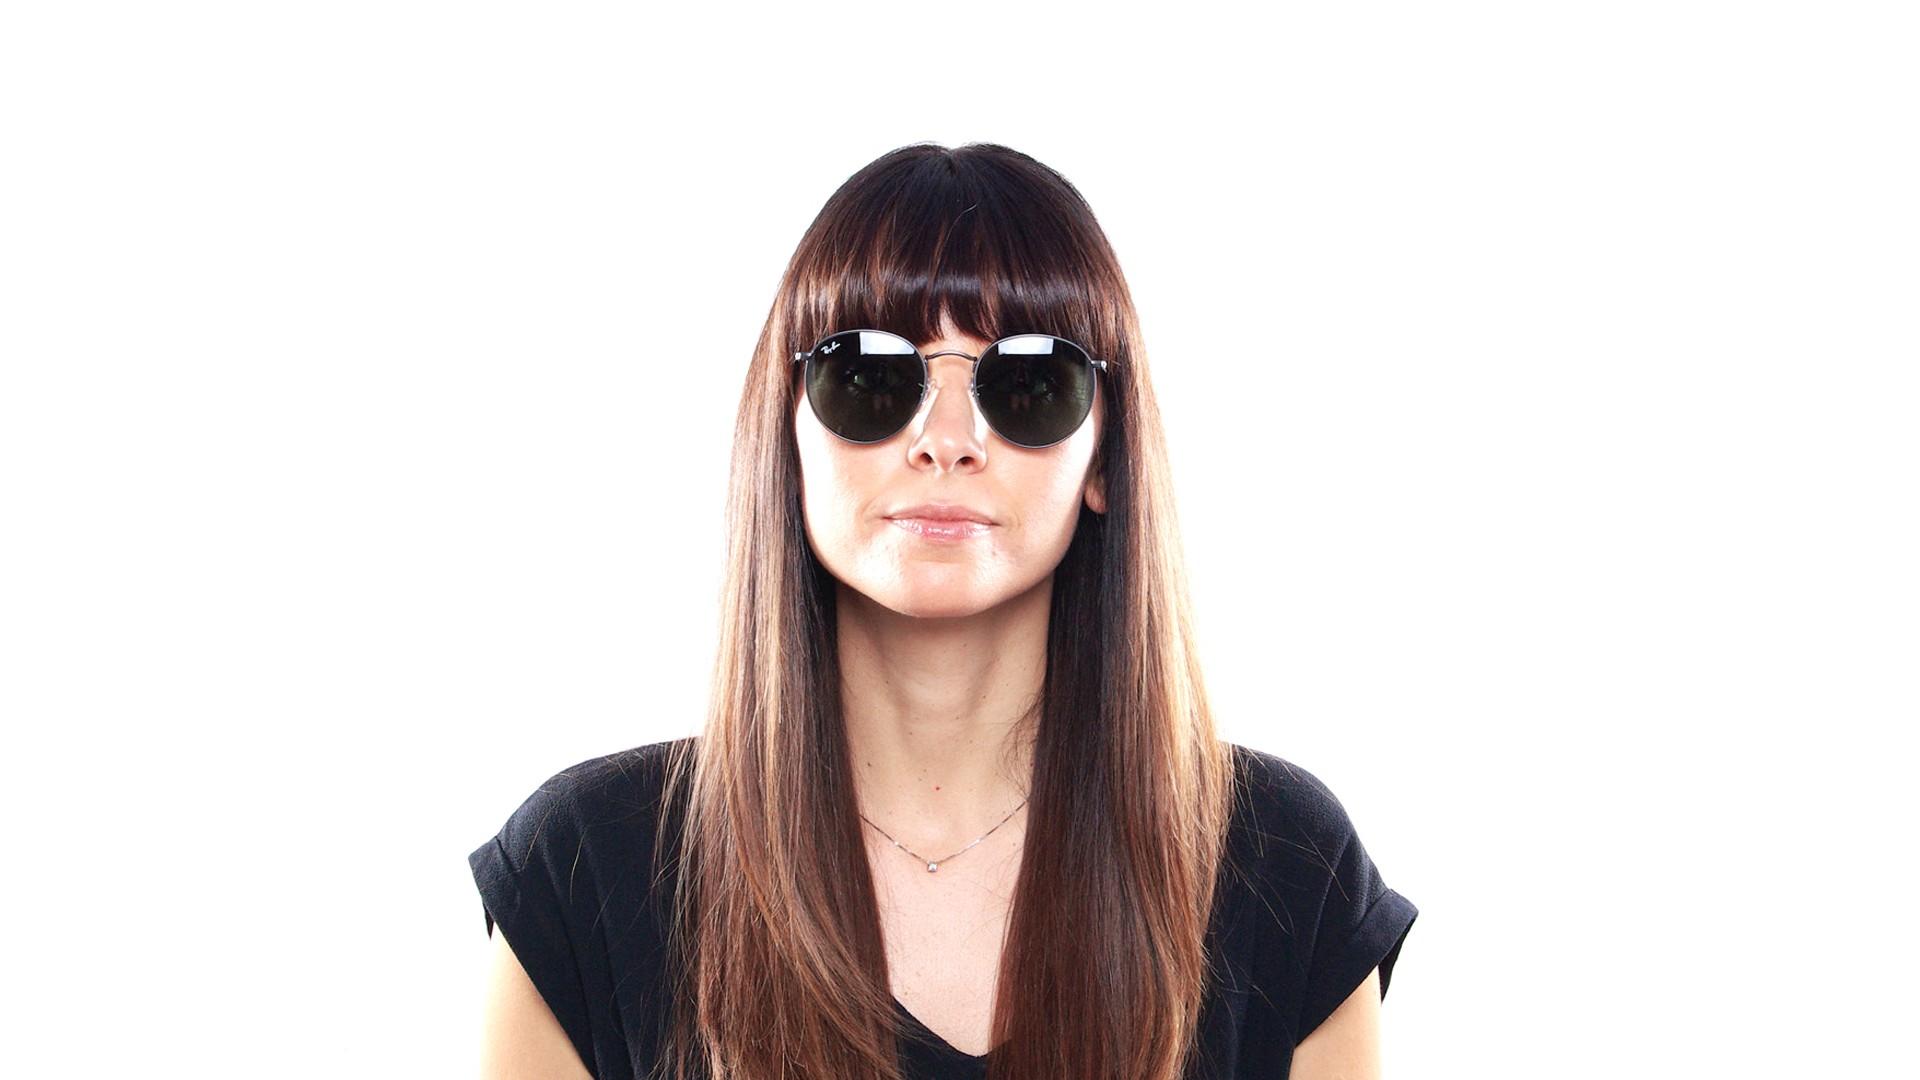 fada22f64f Sunglasses Ray-Ban Round Metal Grey Matte G-15 RB3447 029 53-21 Large